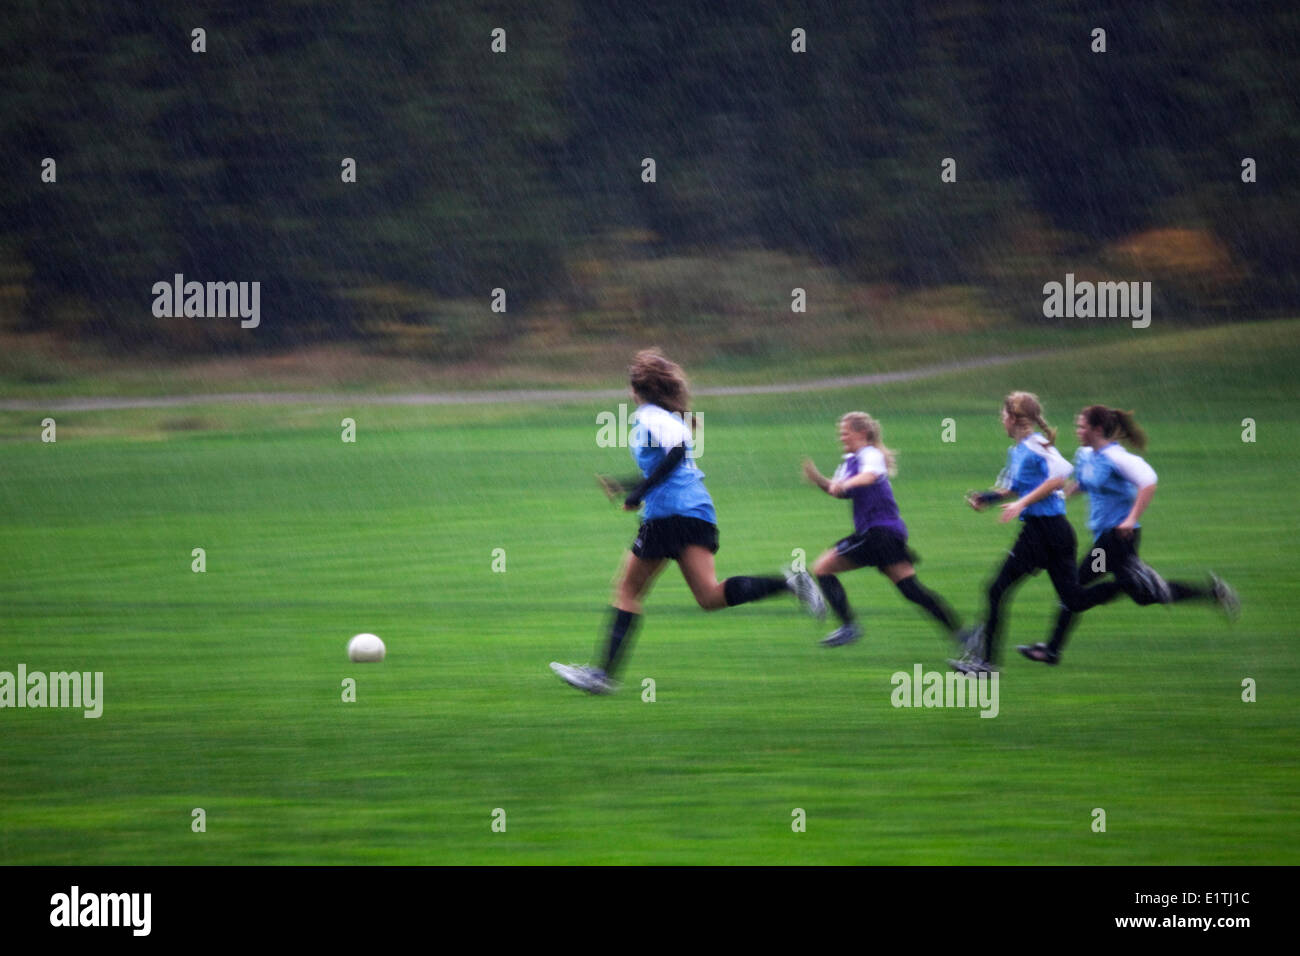 Girl's Soccer, Rain, Team Sports, Physical Activity, Health, Gibson's, Sunshine Coast, B.C., Canada - Stock Image